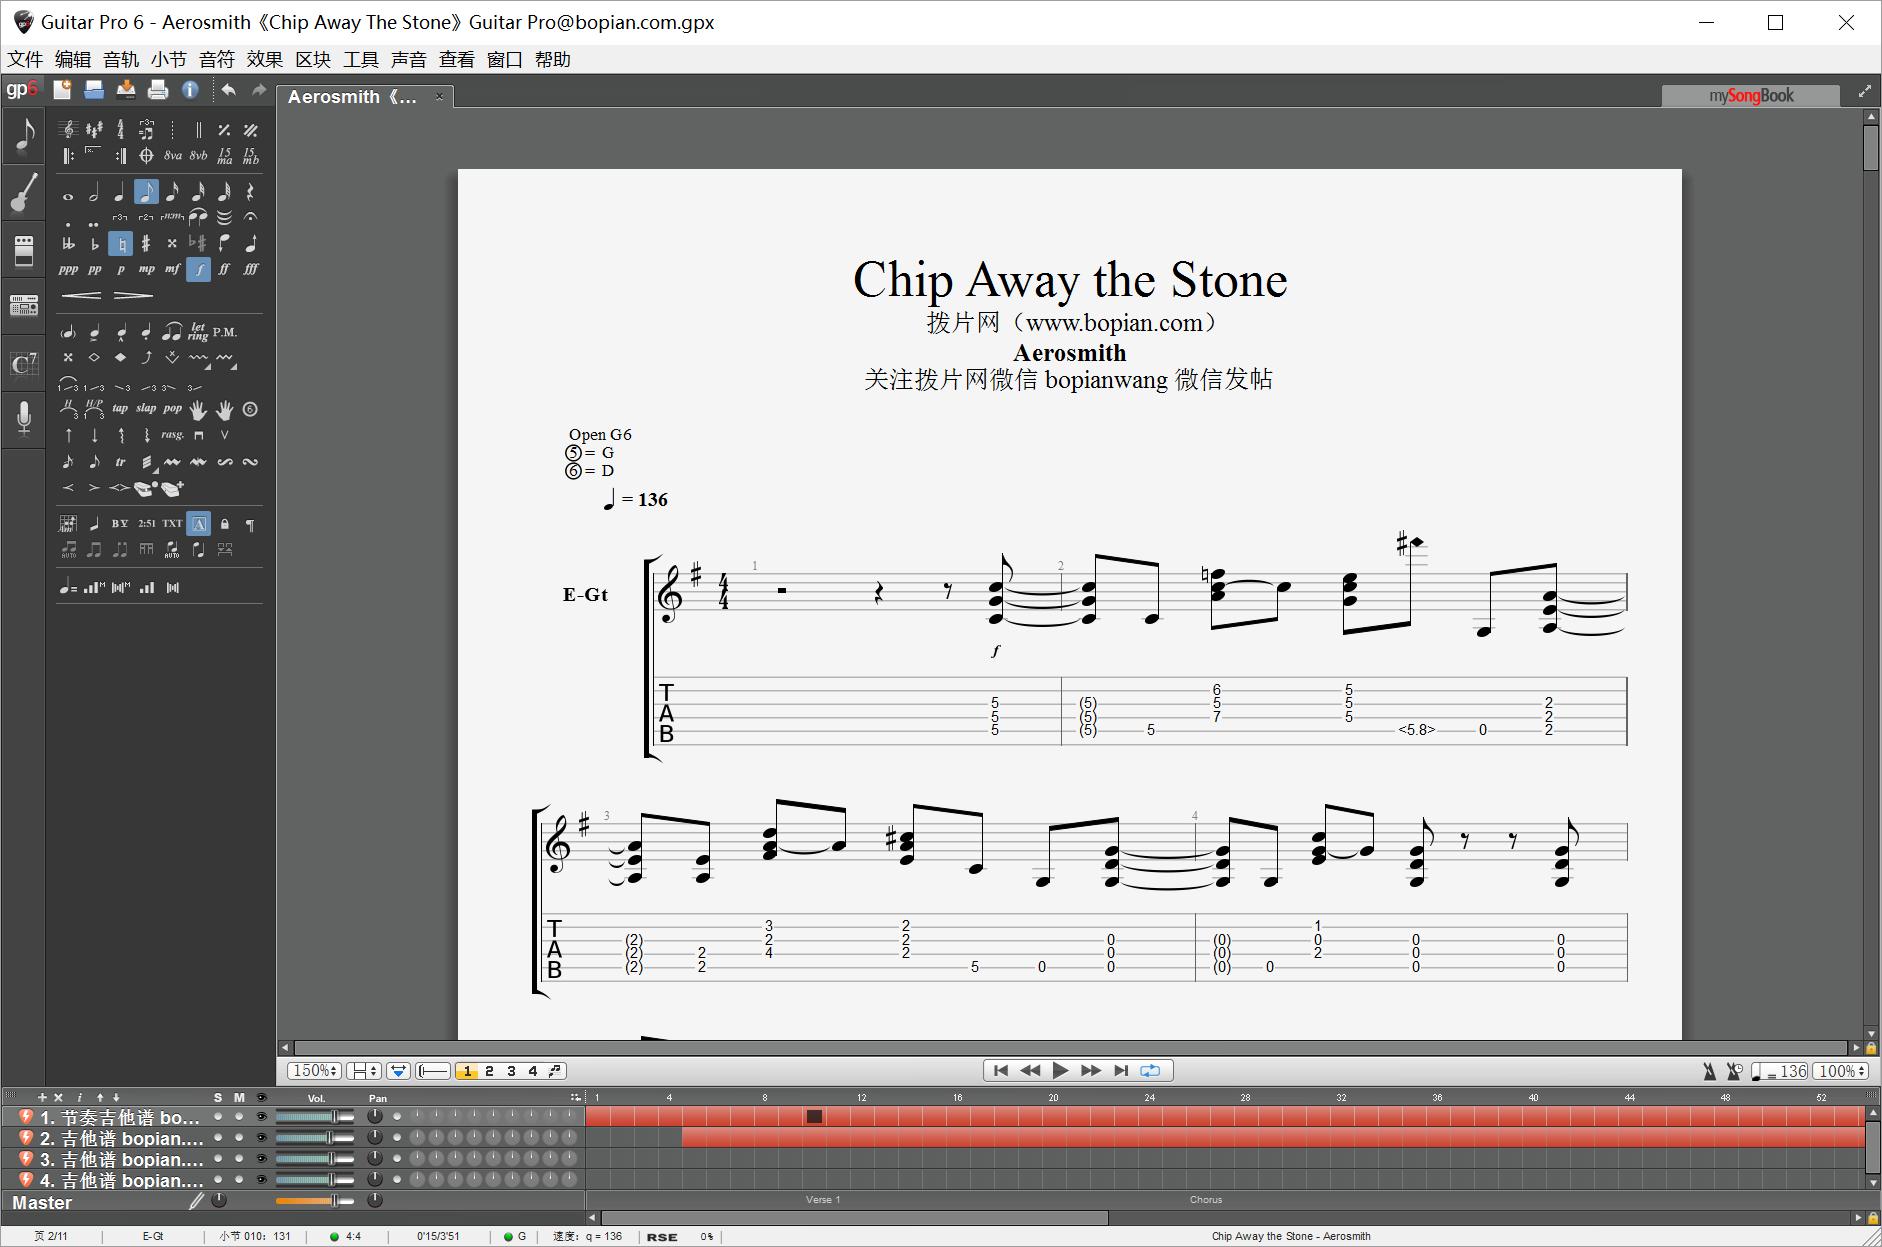 拨片网_乐队谱_Aerosmith《Chip_Away_The_Stone》Guitar_Pro@bopian.com_.png